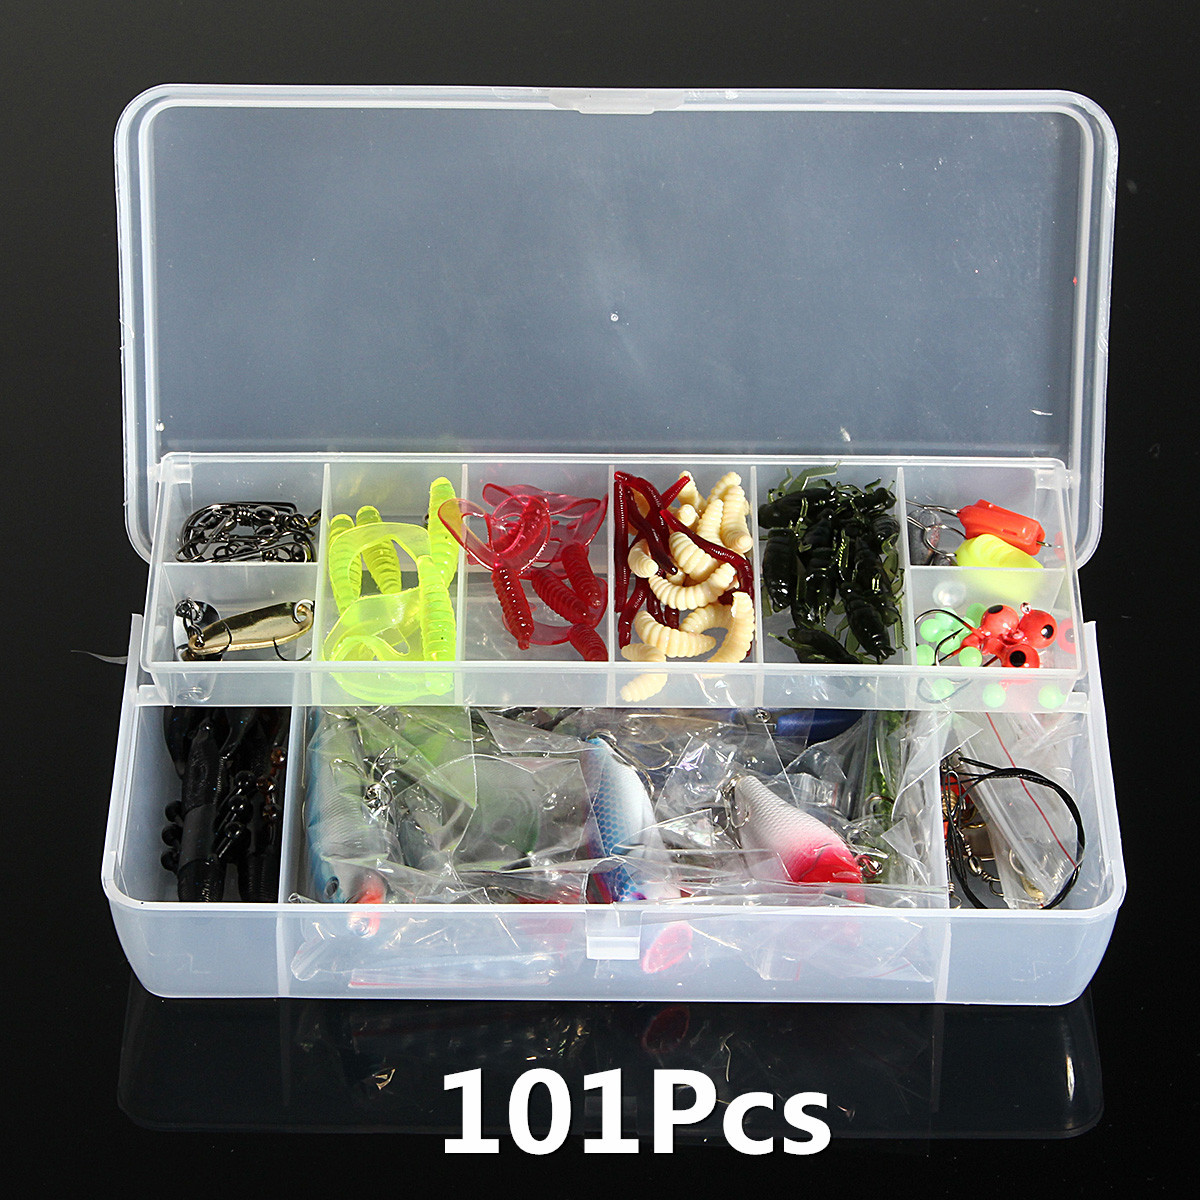 101Pcs Minnow Fishing Lure Set Hard Soft Crankbait Swimbait Two-layers Tackle Bo